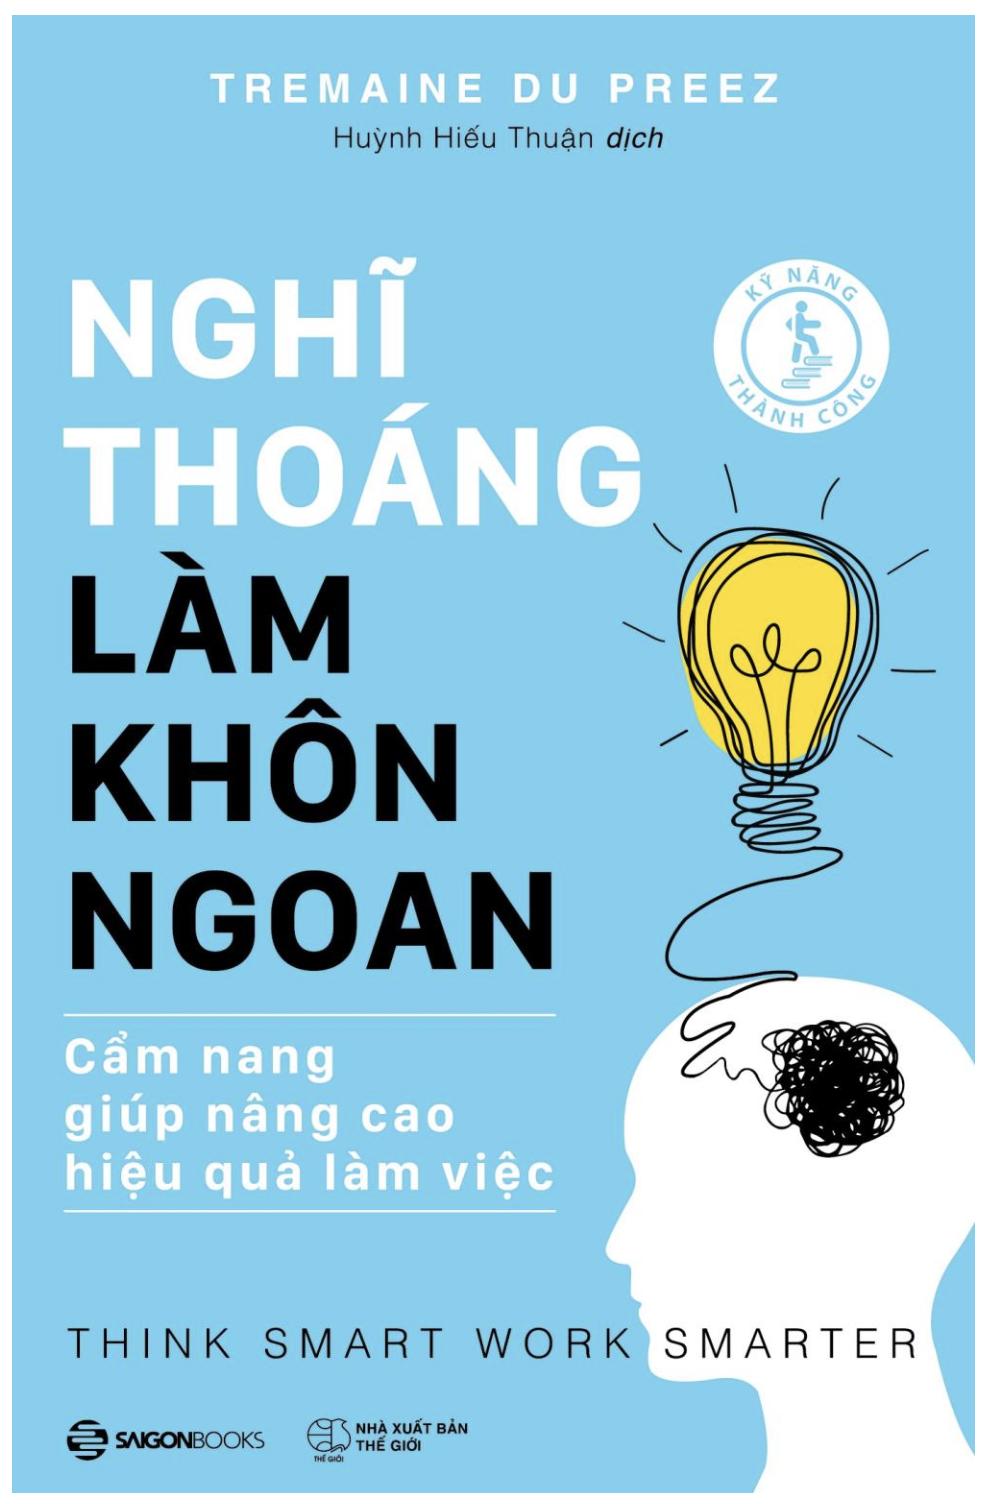 Think Smart, Work Smarter. Vietnamese edition, 2018